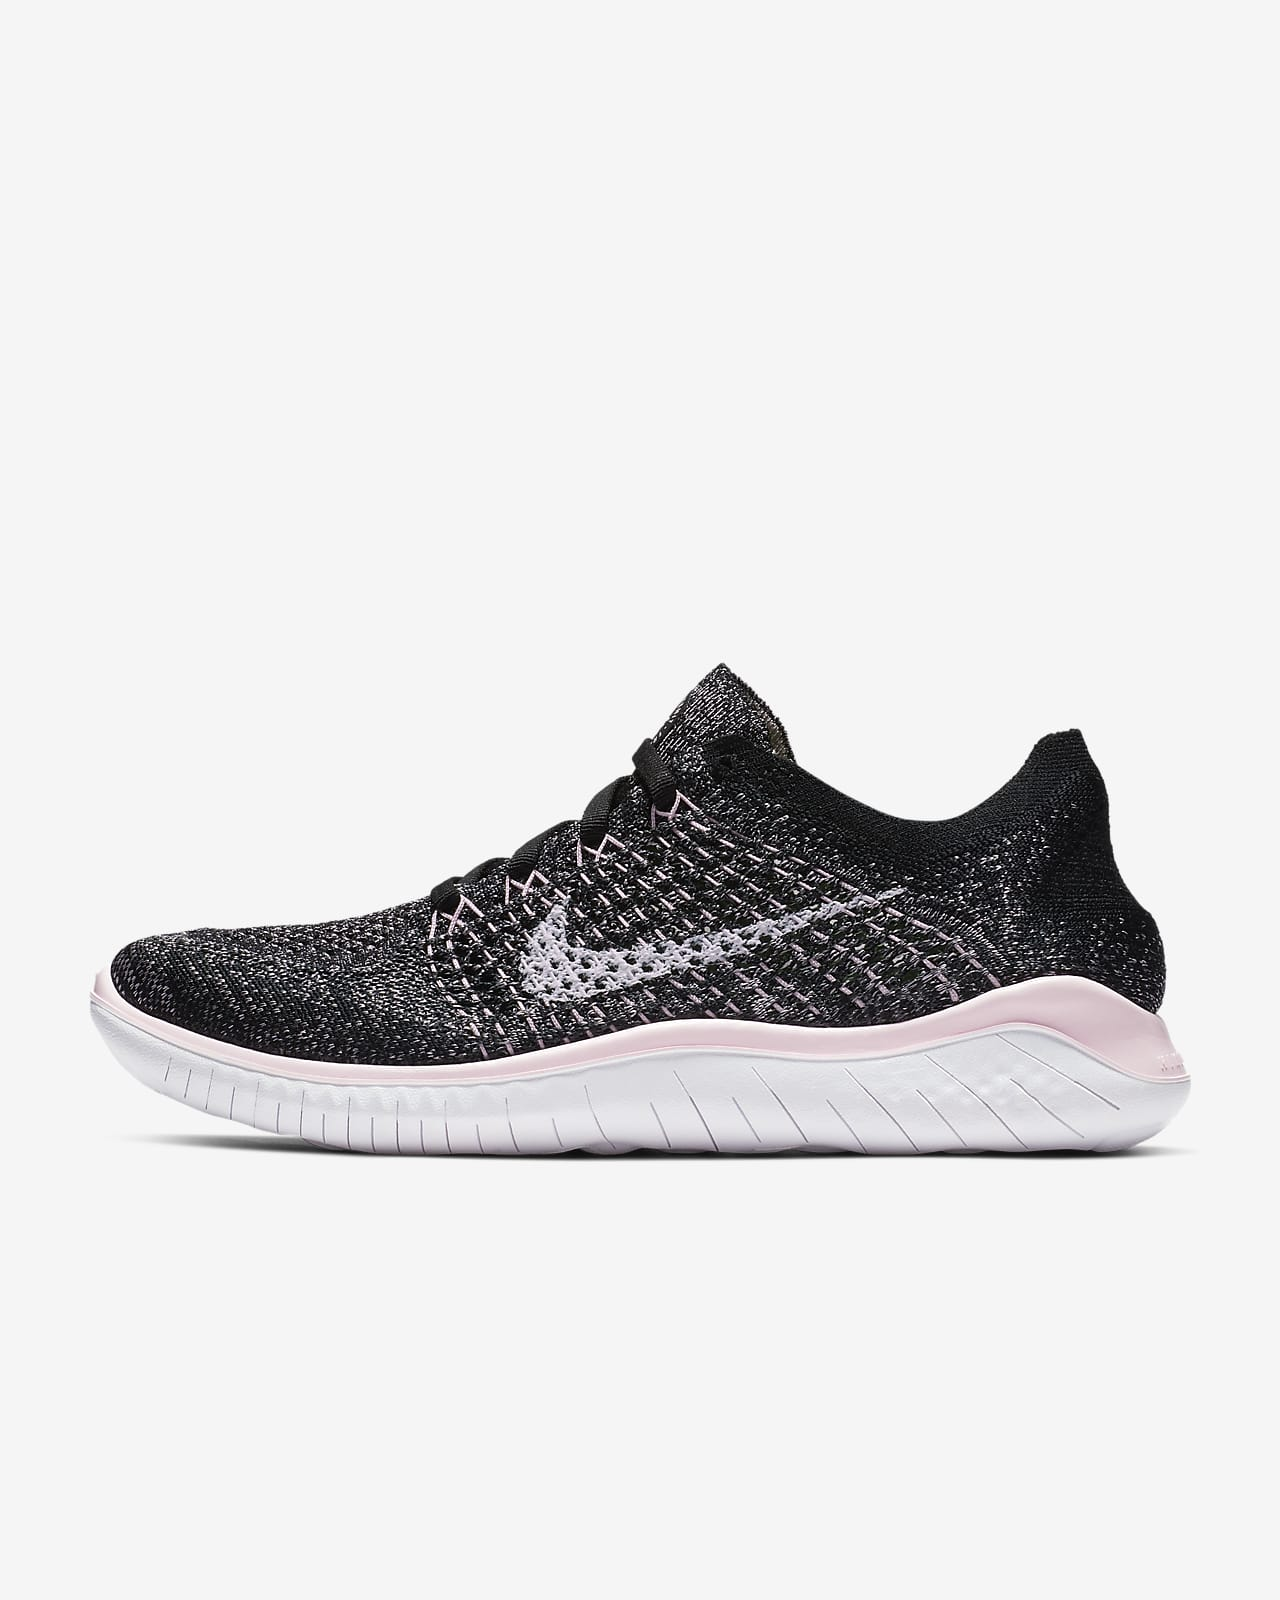 Medalla Molesto Buscar  Nike Free RN Flyknit 2018 Women's Running Shoe. Nike.com